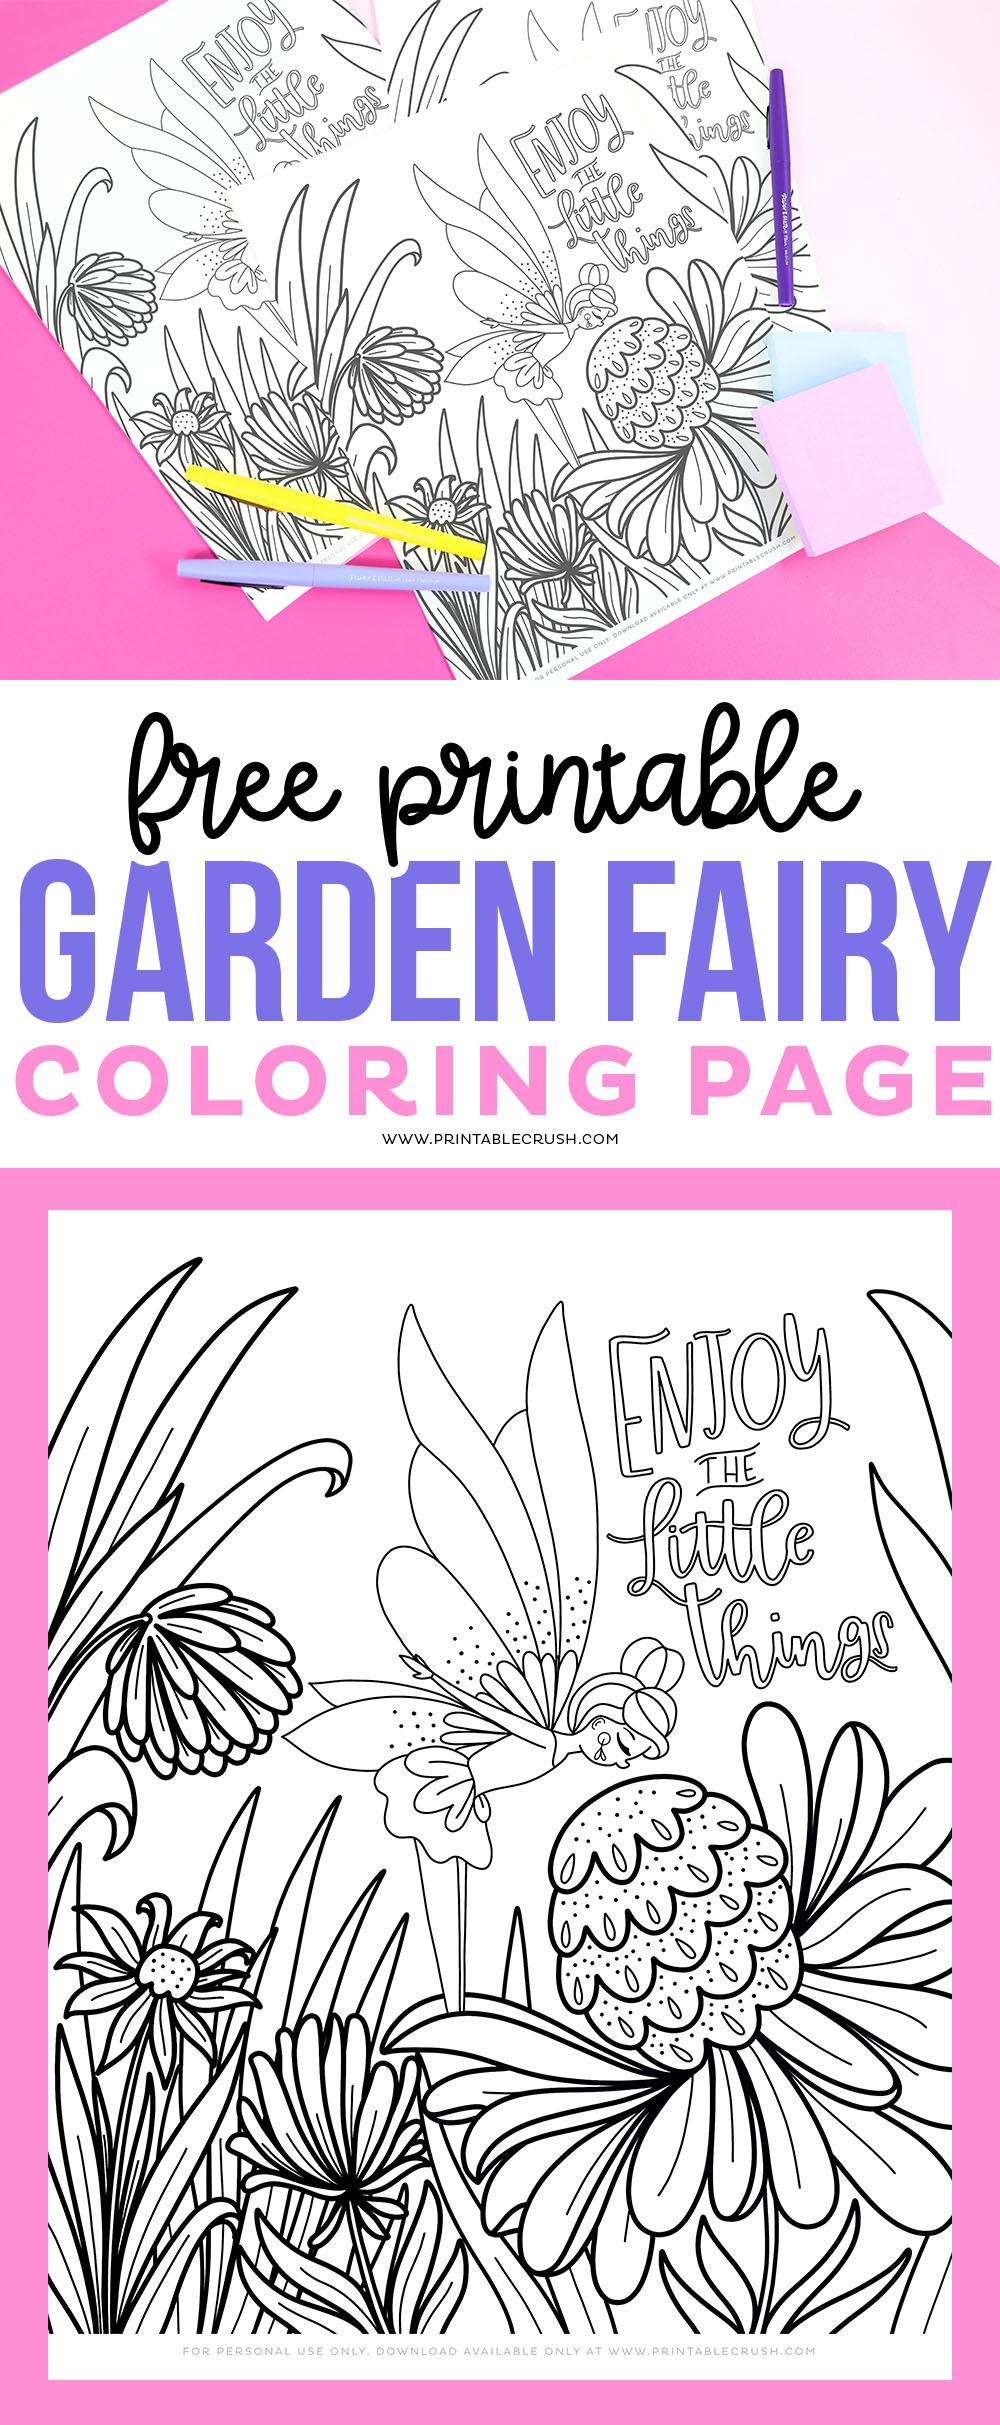 Free Fairy Coloring Page - printable download via @printablecrush